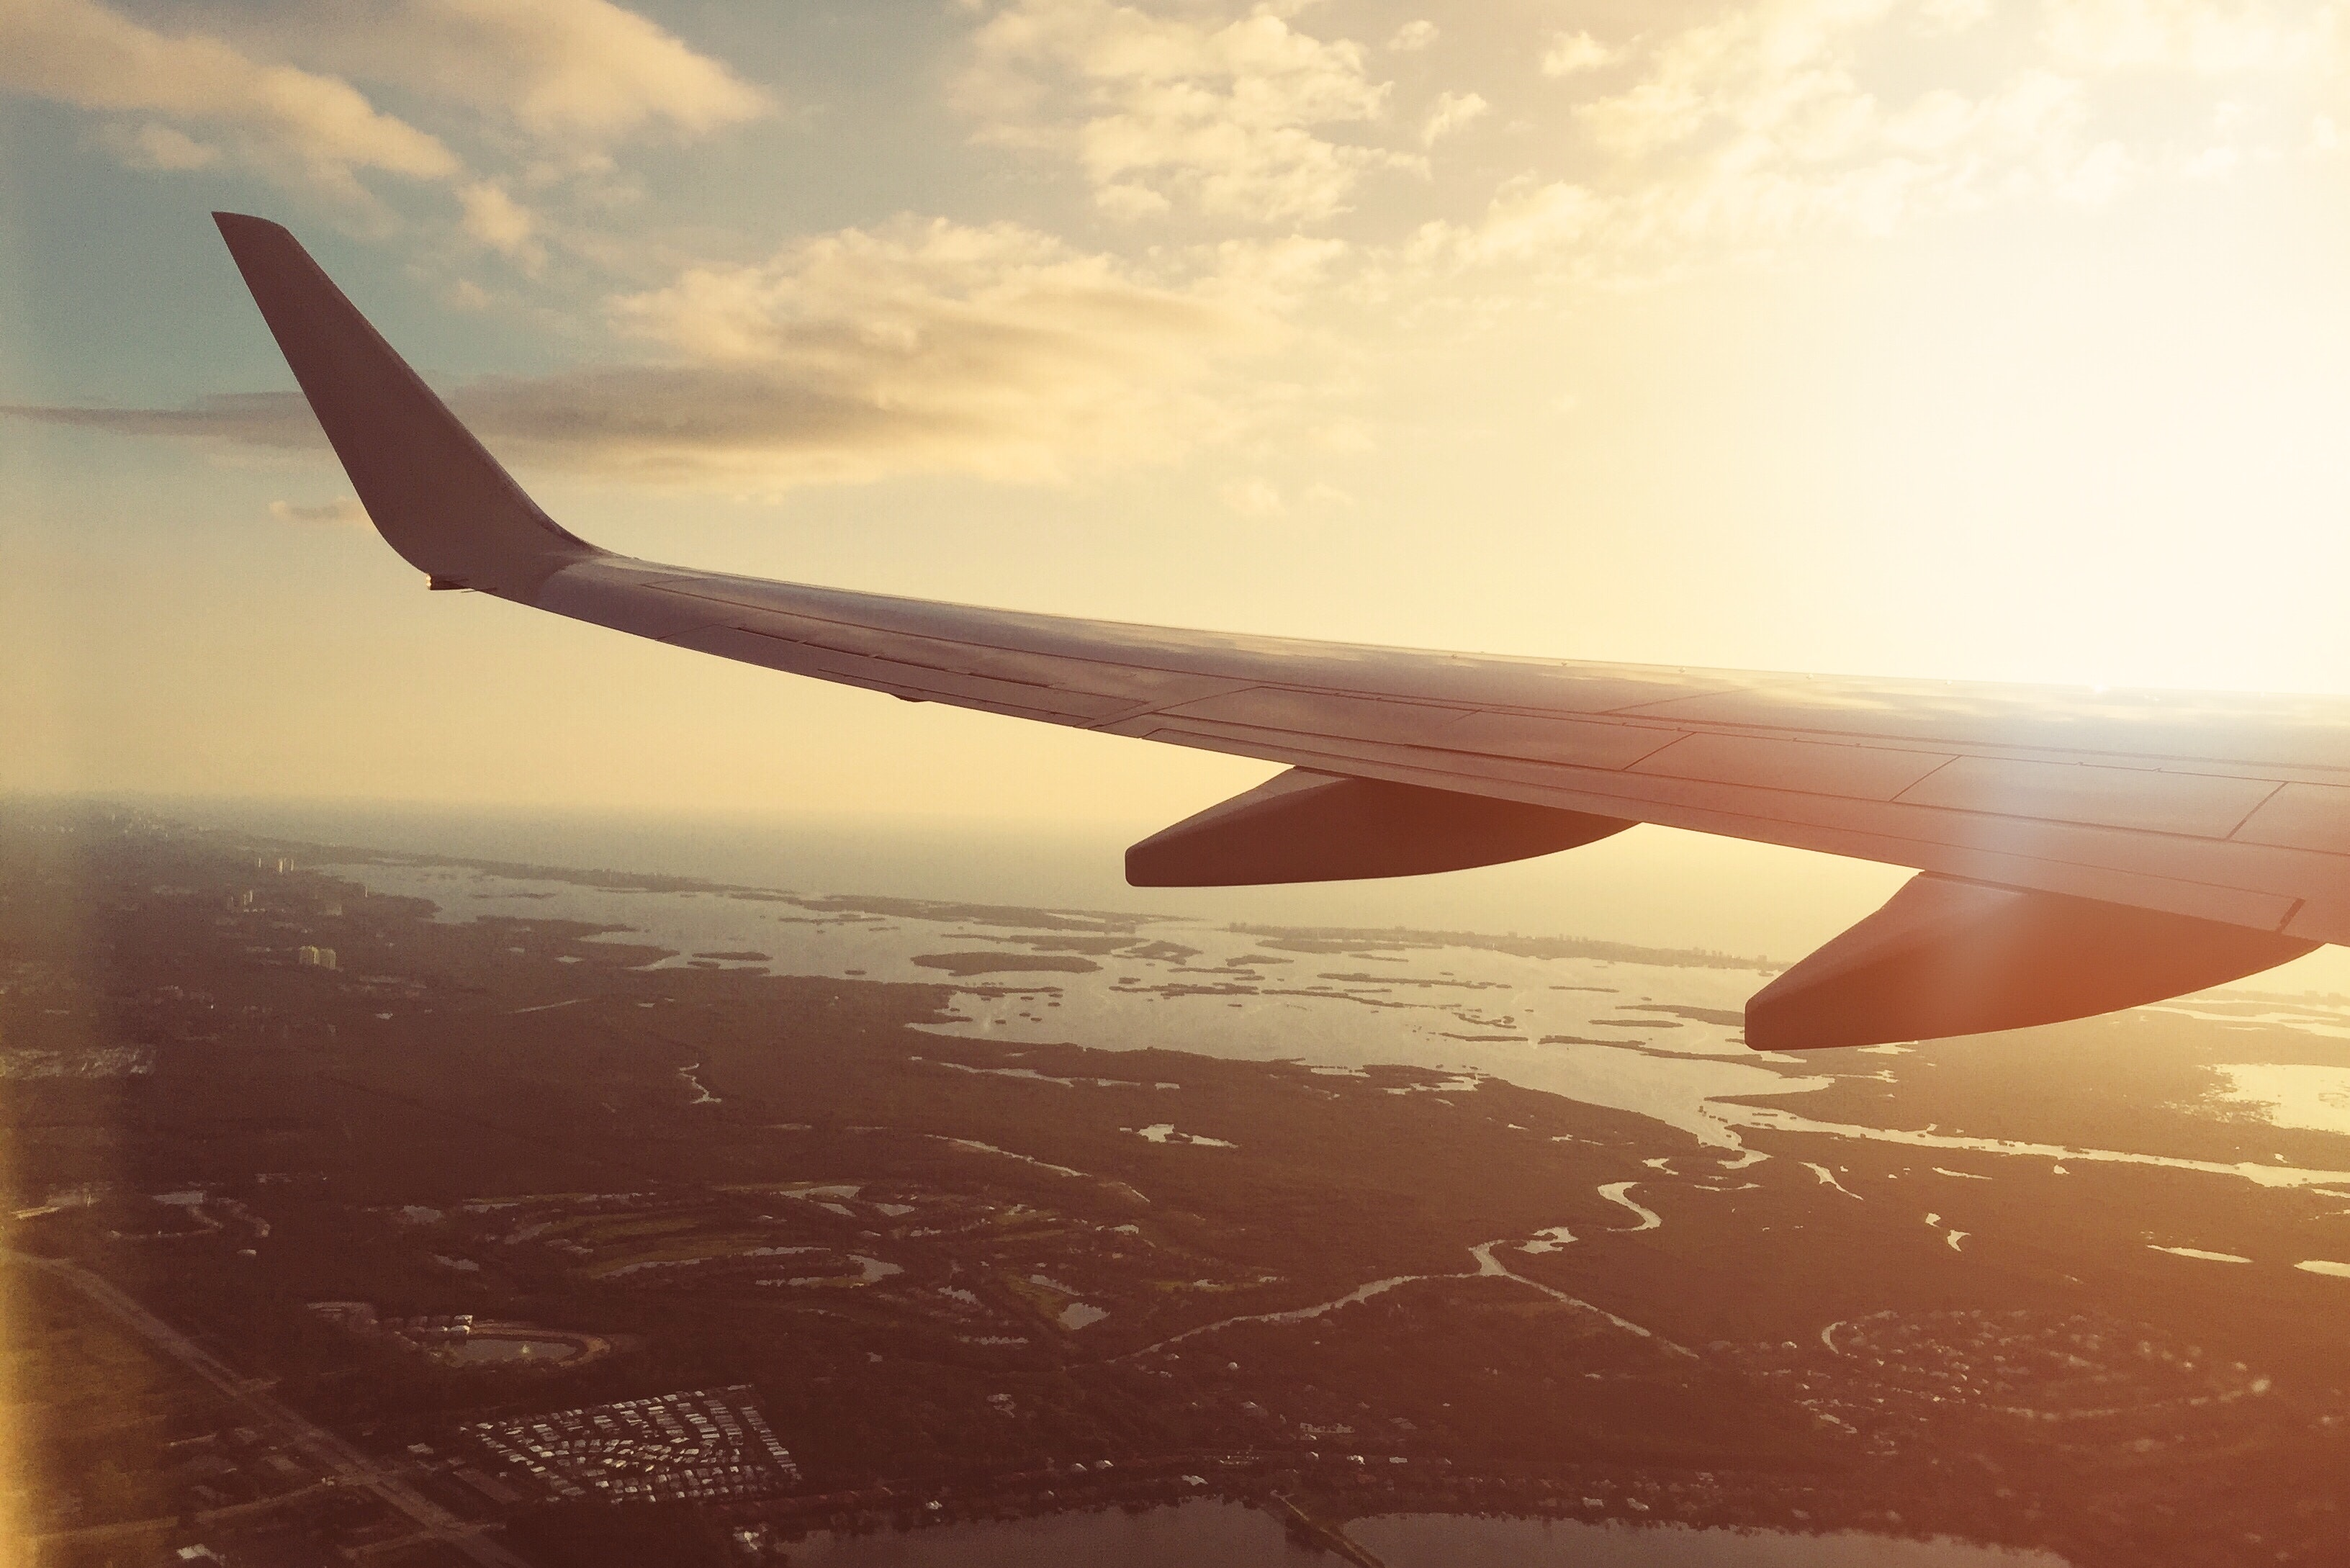 aerial-aerial-view-aeroplane-59519